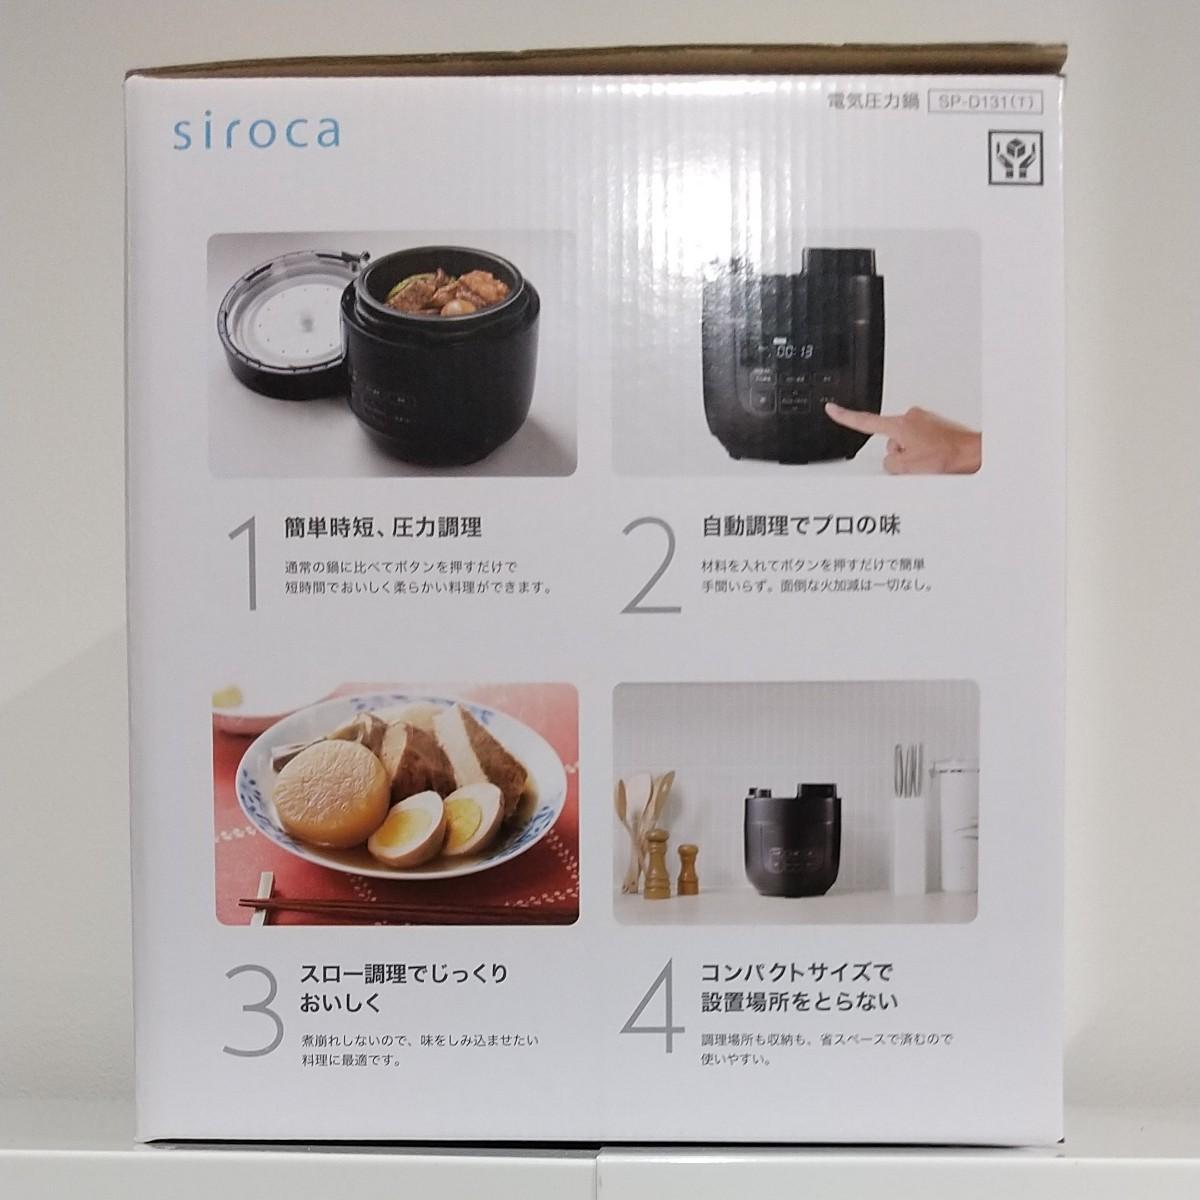 siroca 電気圧力鍋 SP-D131 ブラウン [圧力/無水/蒸し/炊飯/スロー調理/温め直し/コンパクト]